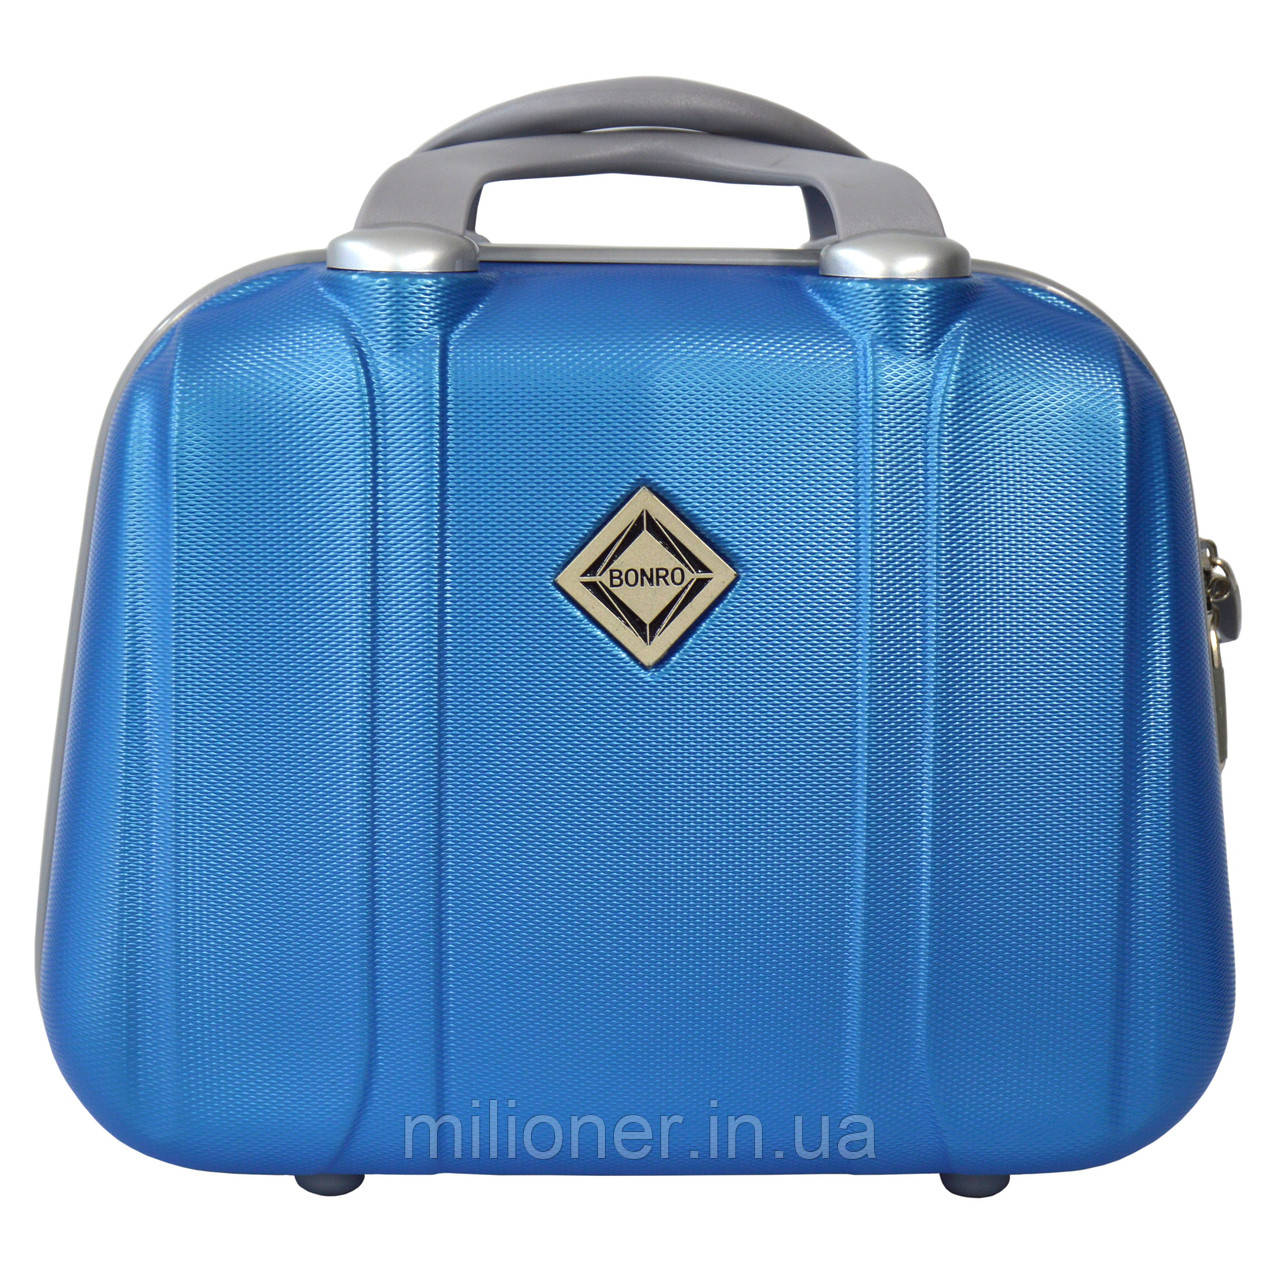 Сумка кейс саквояж Bonro Smile (средний) светло синий (blue 656)